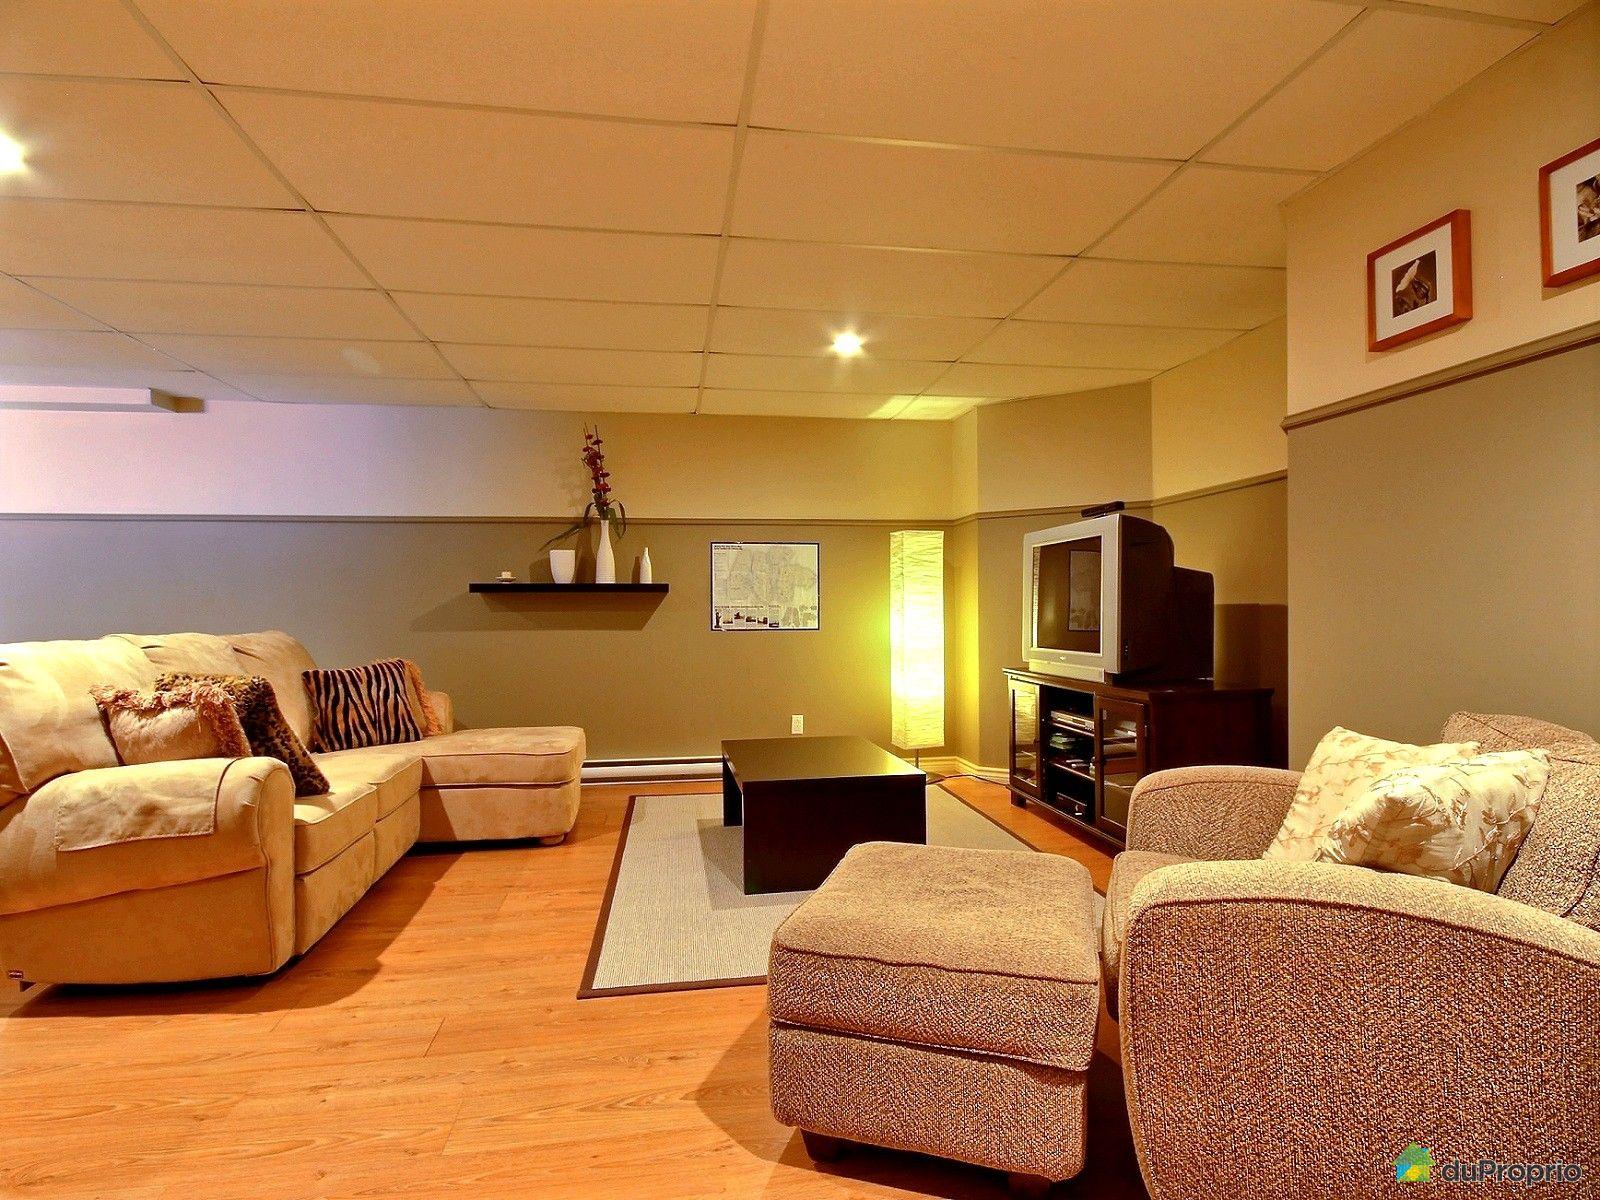 jumel vendu terrebonne immobilier qu bec duproprio 474180. Black Bedroom Furniture Sets. Home Design Ideas